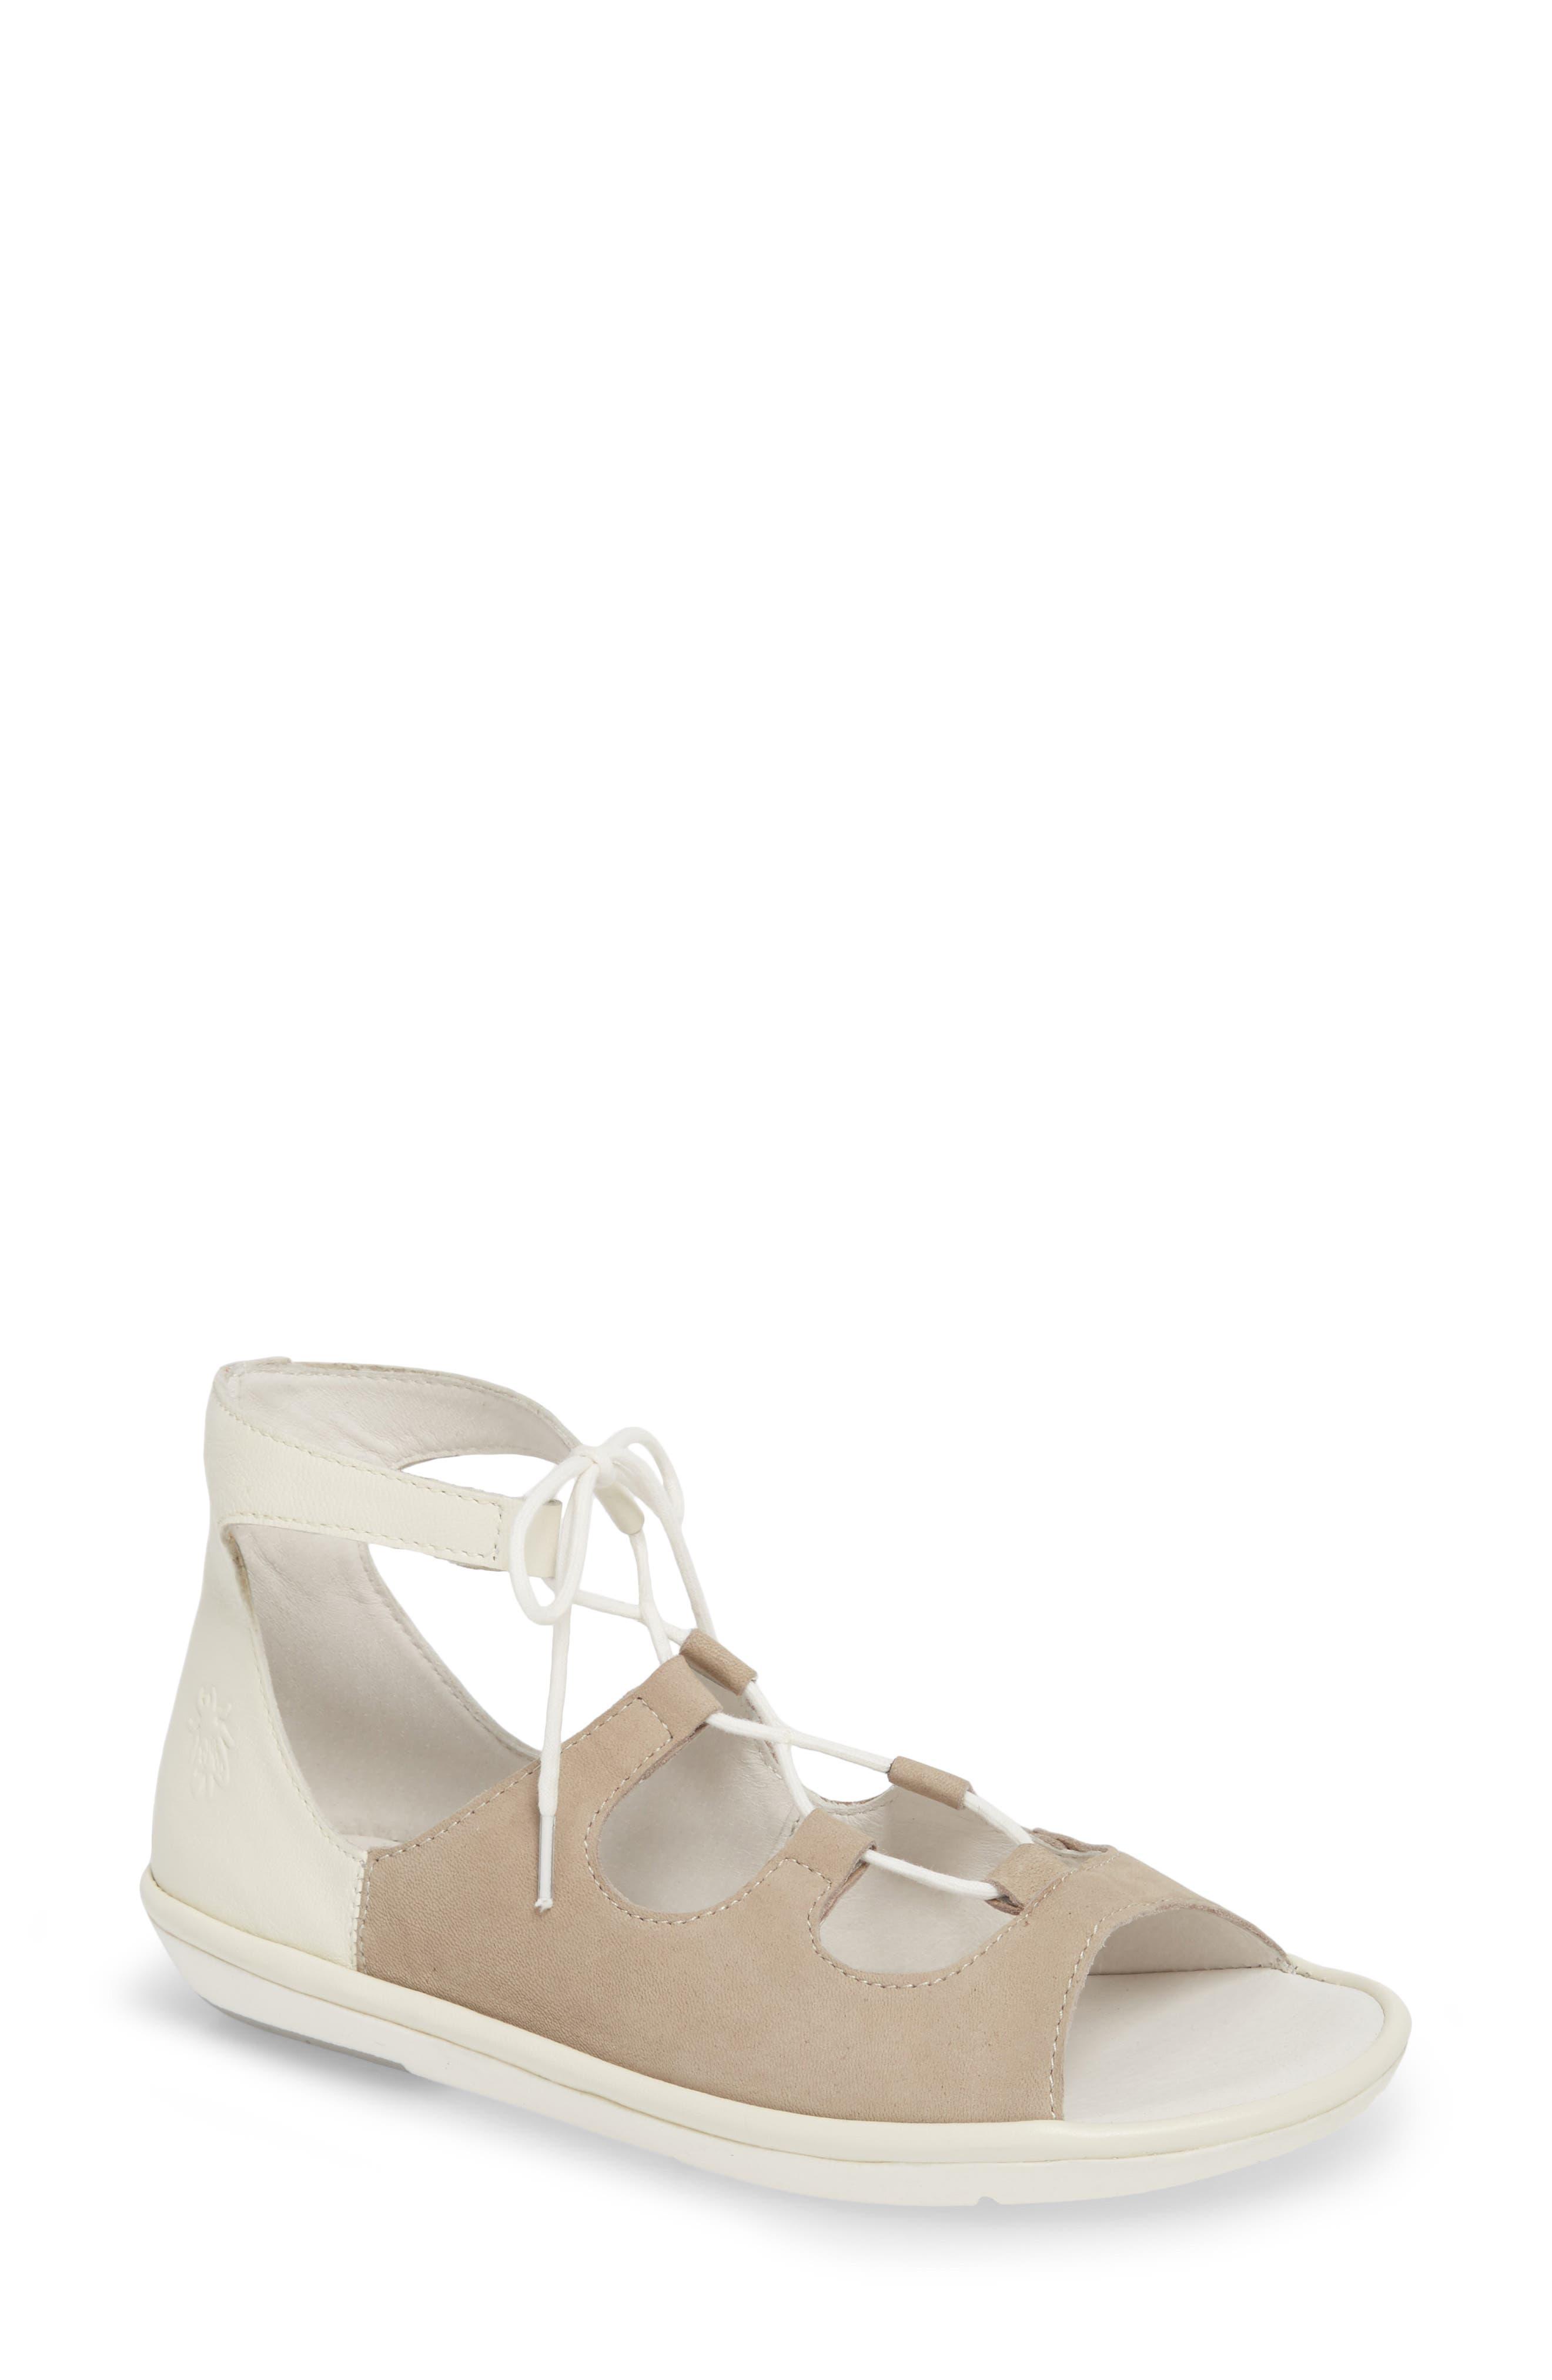 Mura Ghillie Sandal,                         Main,                         color, Cloud/ Off White